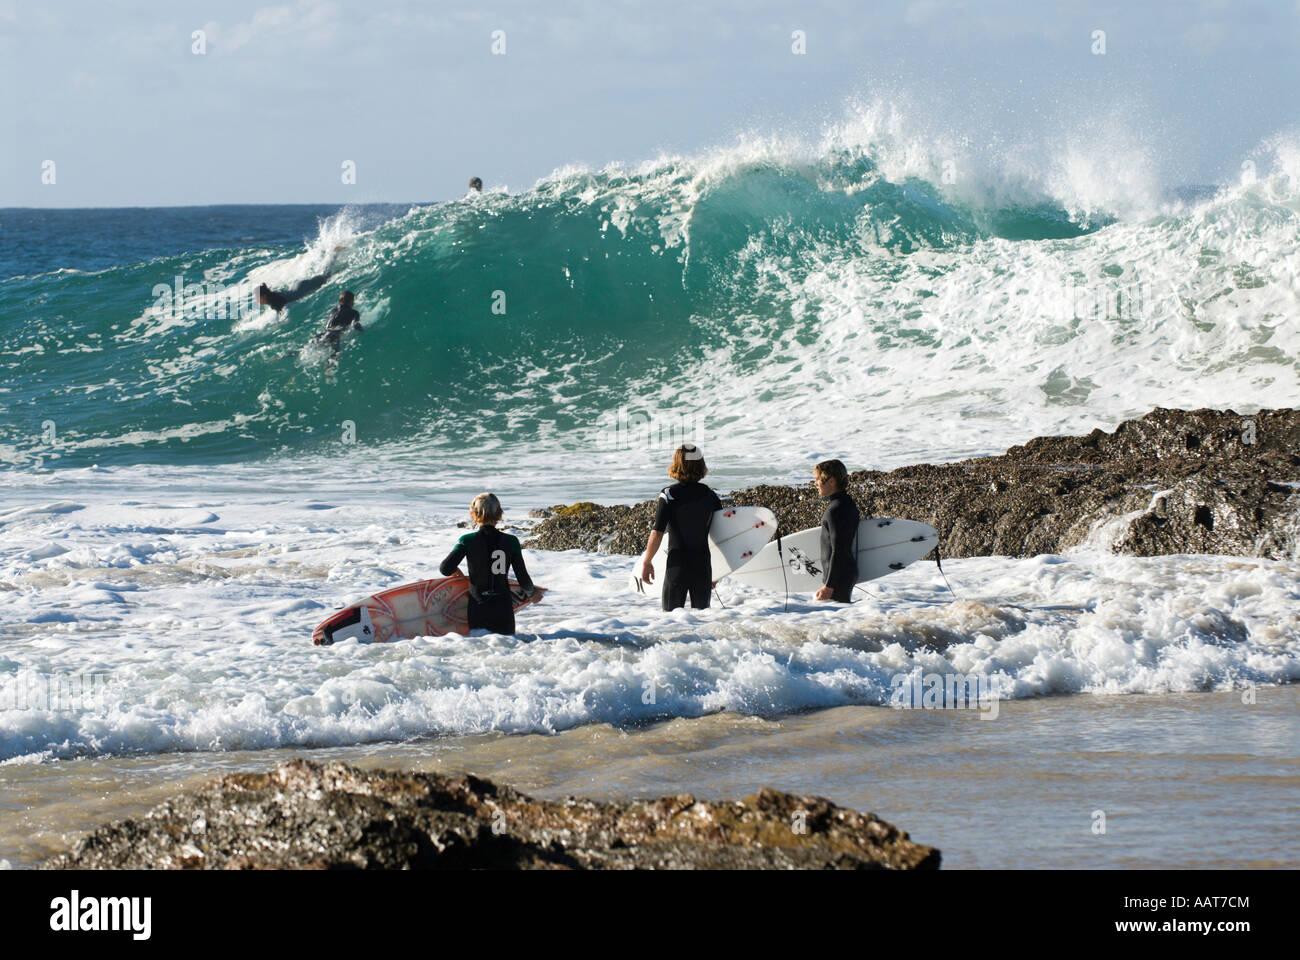 Surfing at Snapper Rocks/Superbank, Coolangatta, Gold Coast, Queensland, Australia Stock Photo